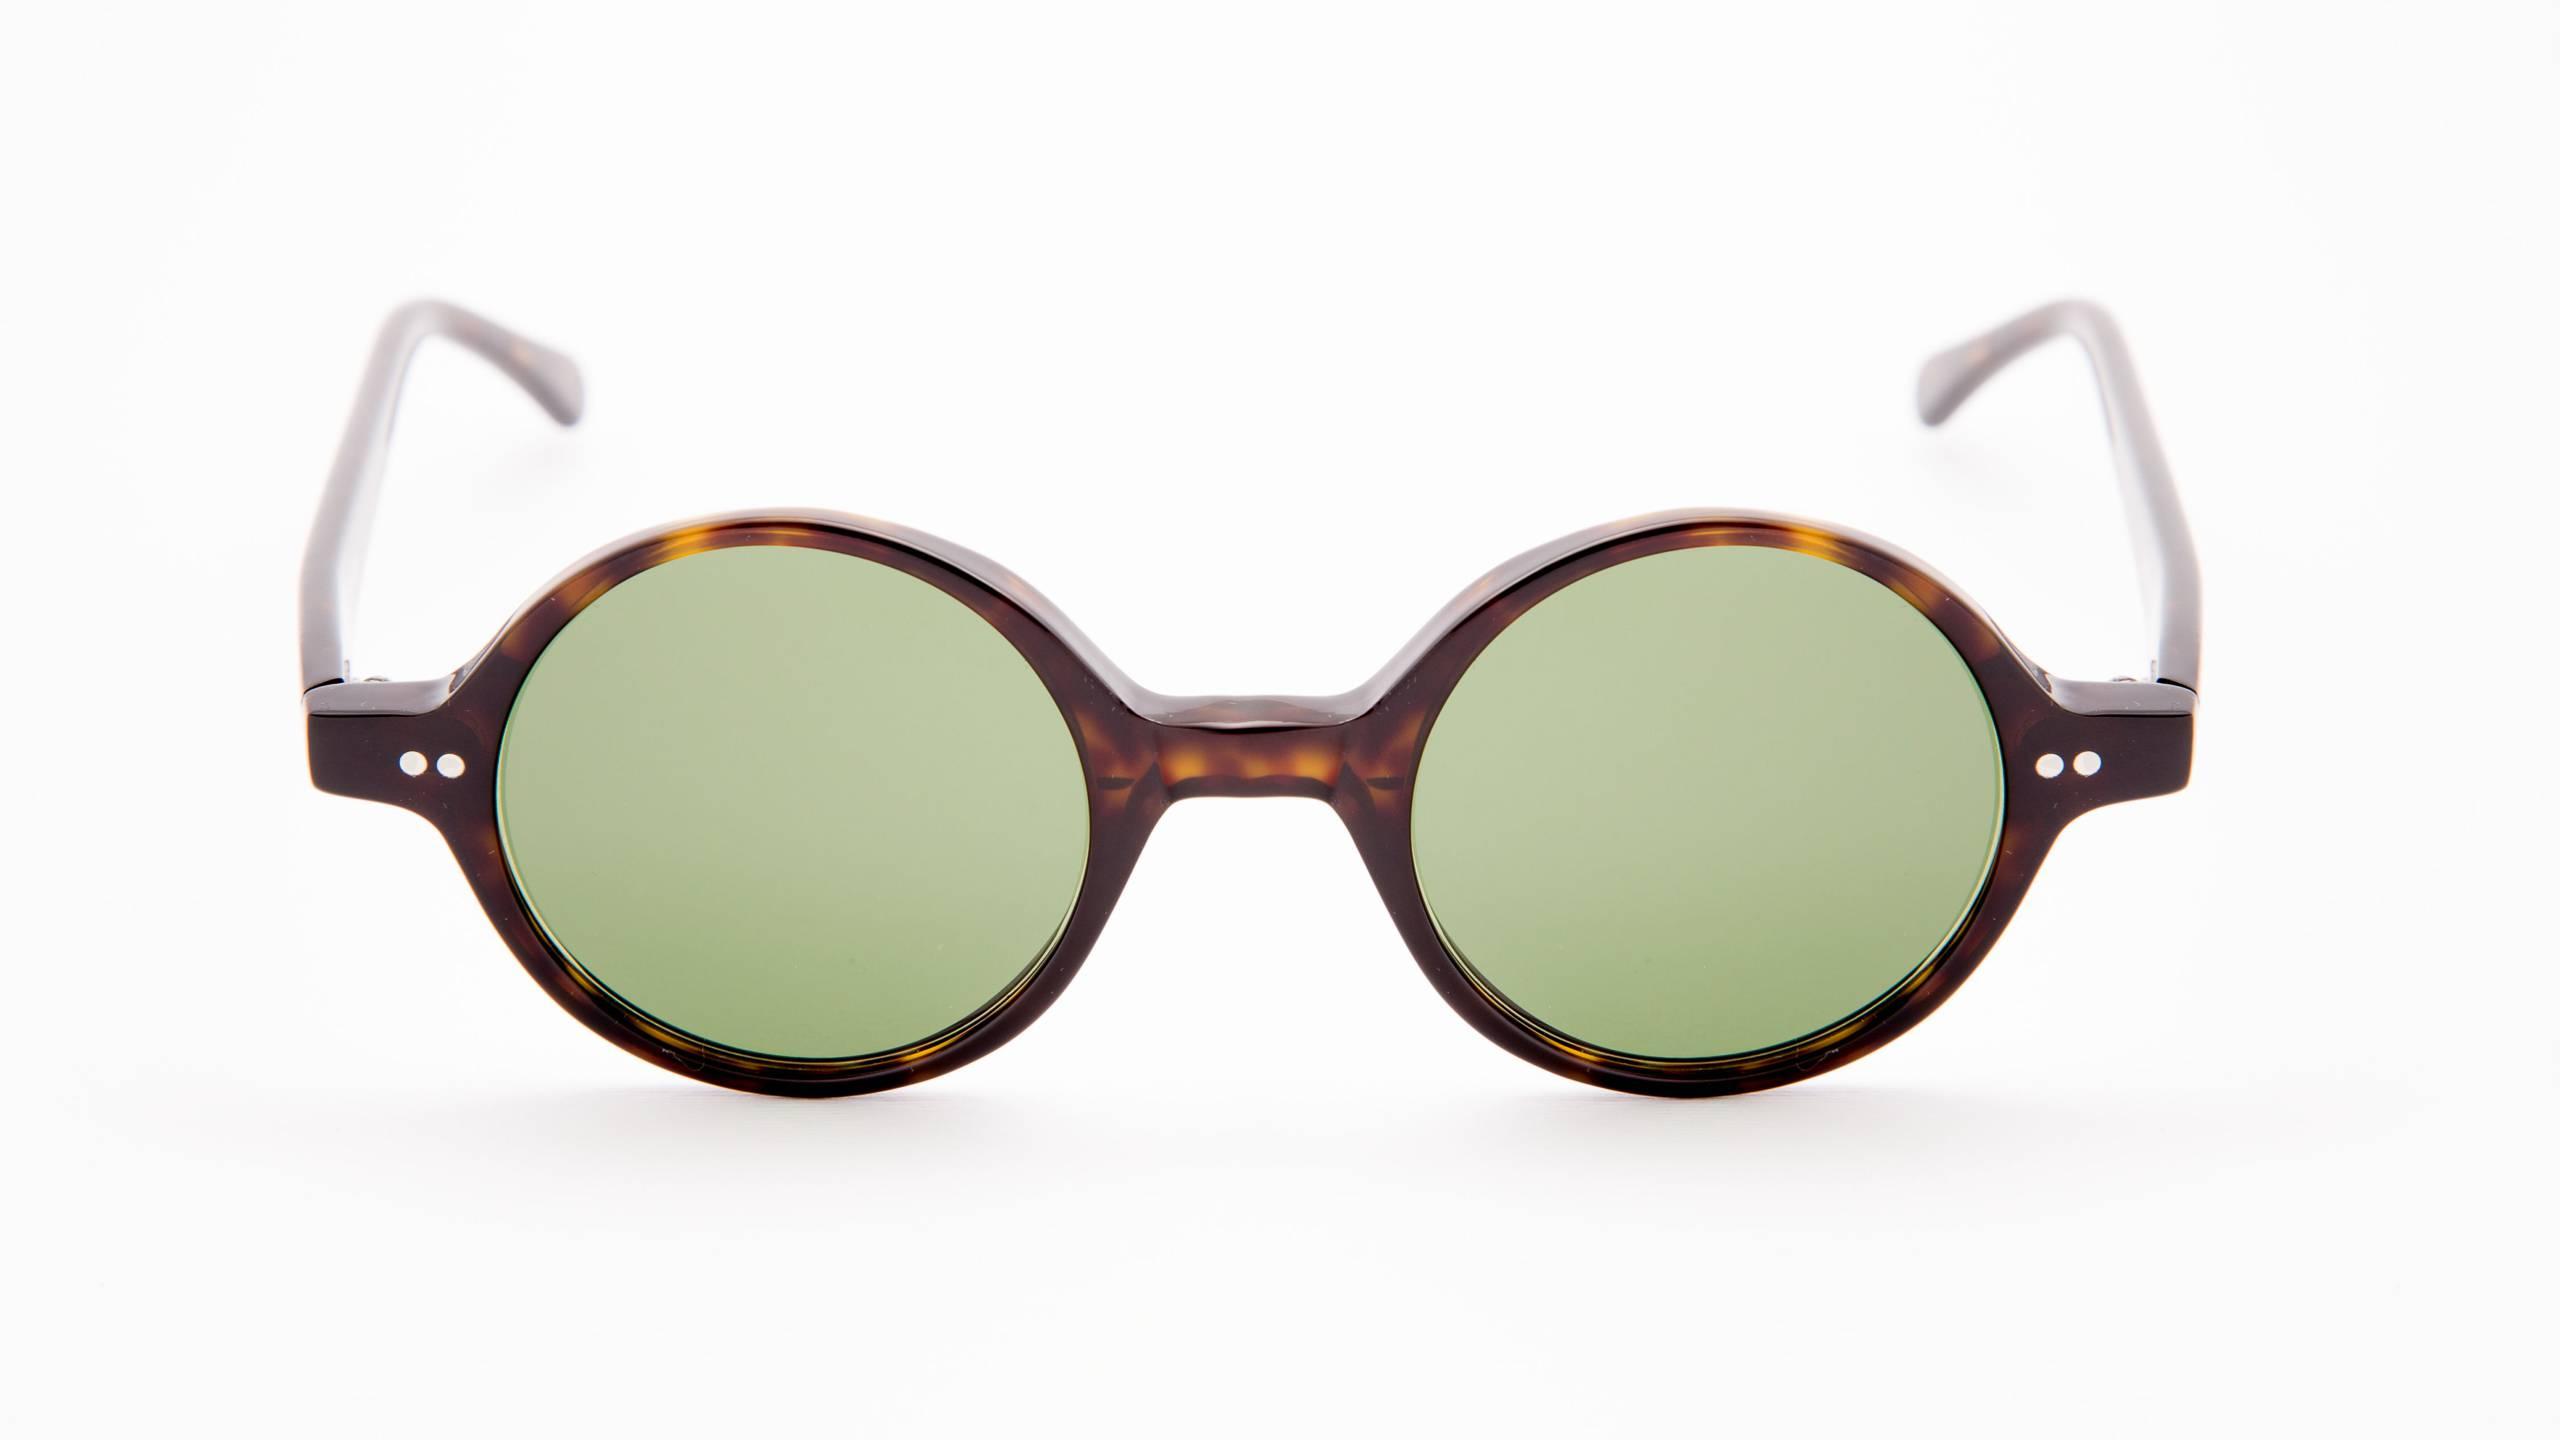 eyeglasses-Nathan-Kaltermann-made-in-Italy-PERFETTINO-COL